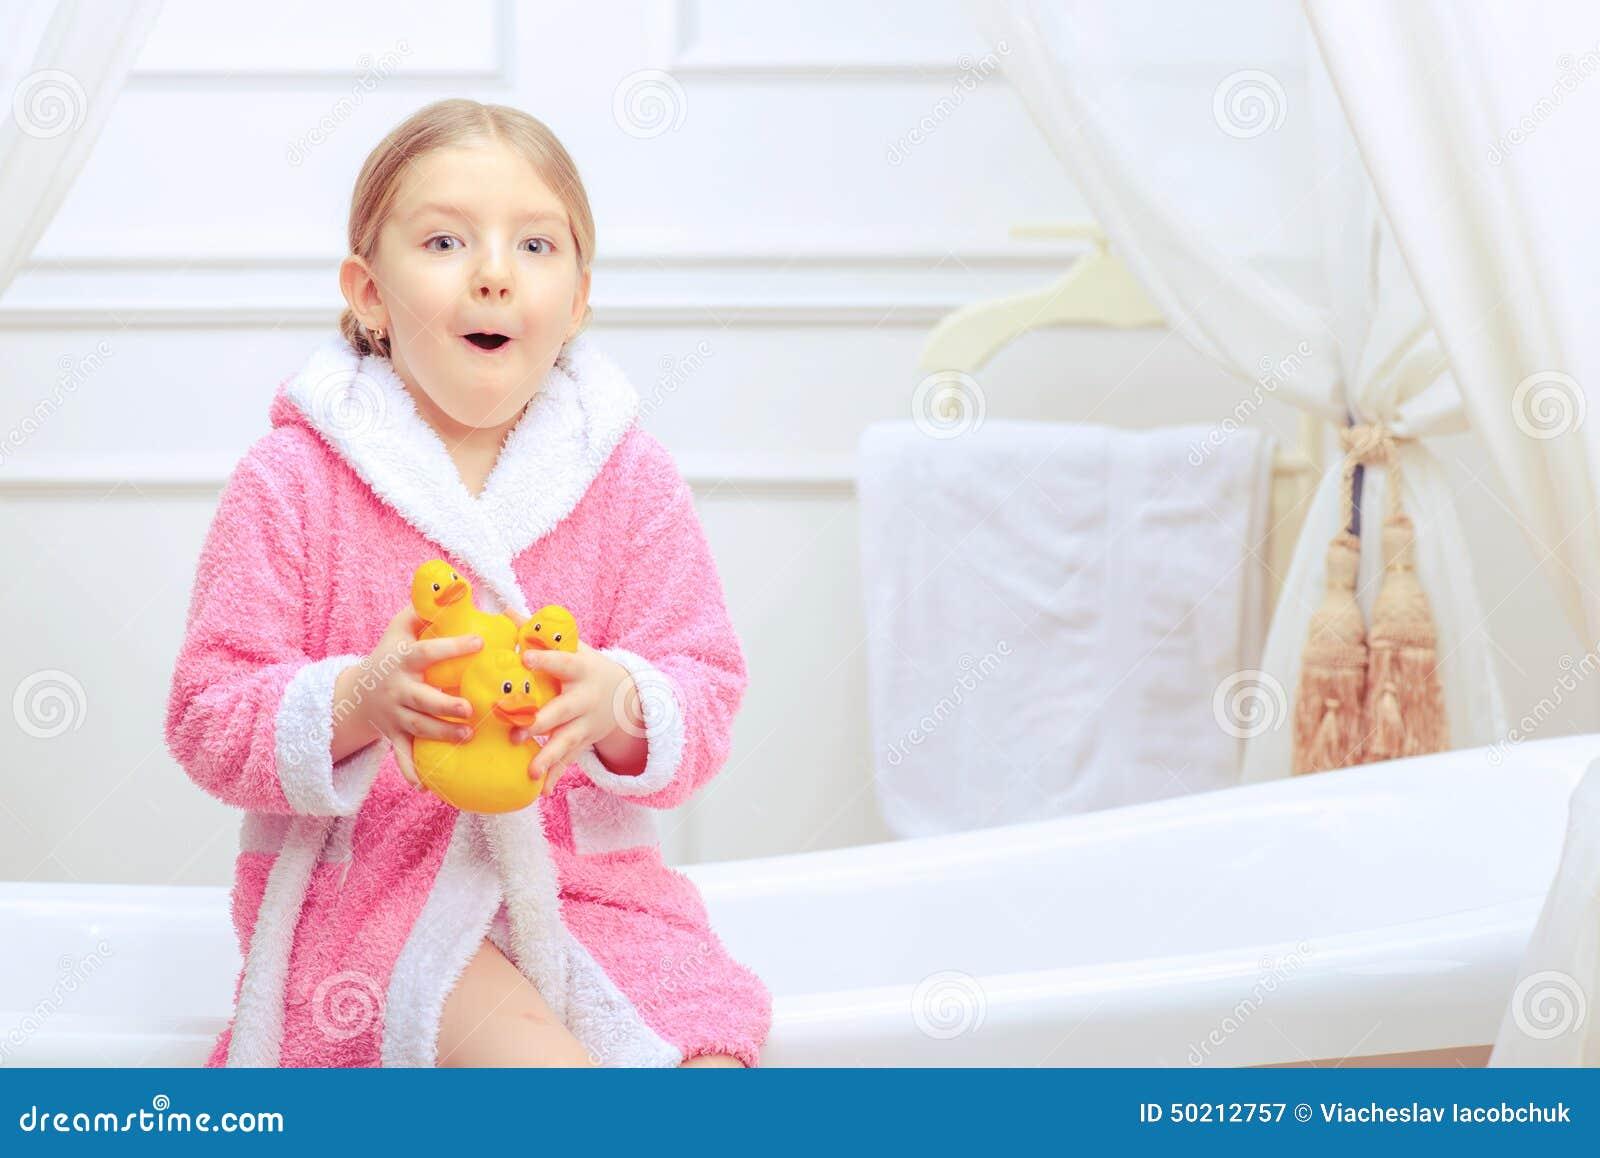 Join. agree young girl bathtime fun